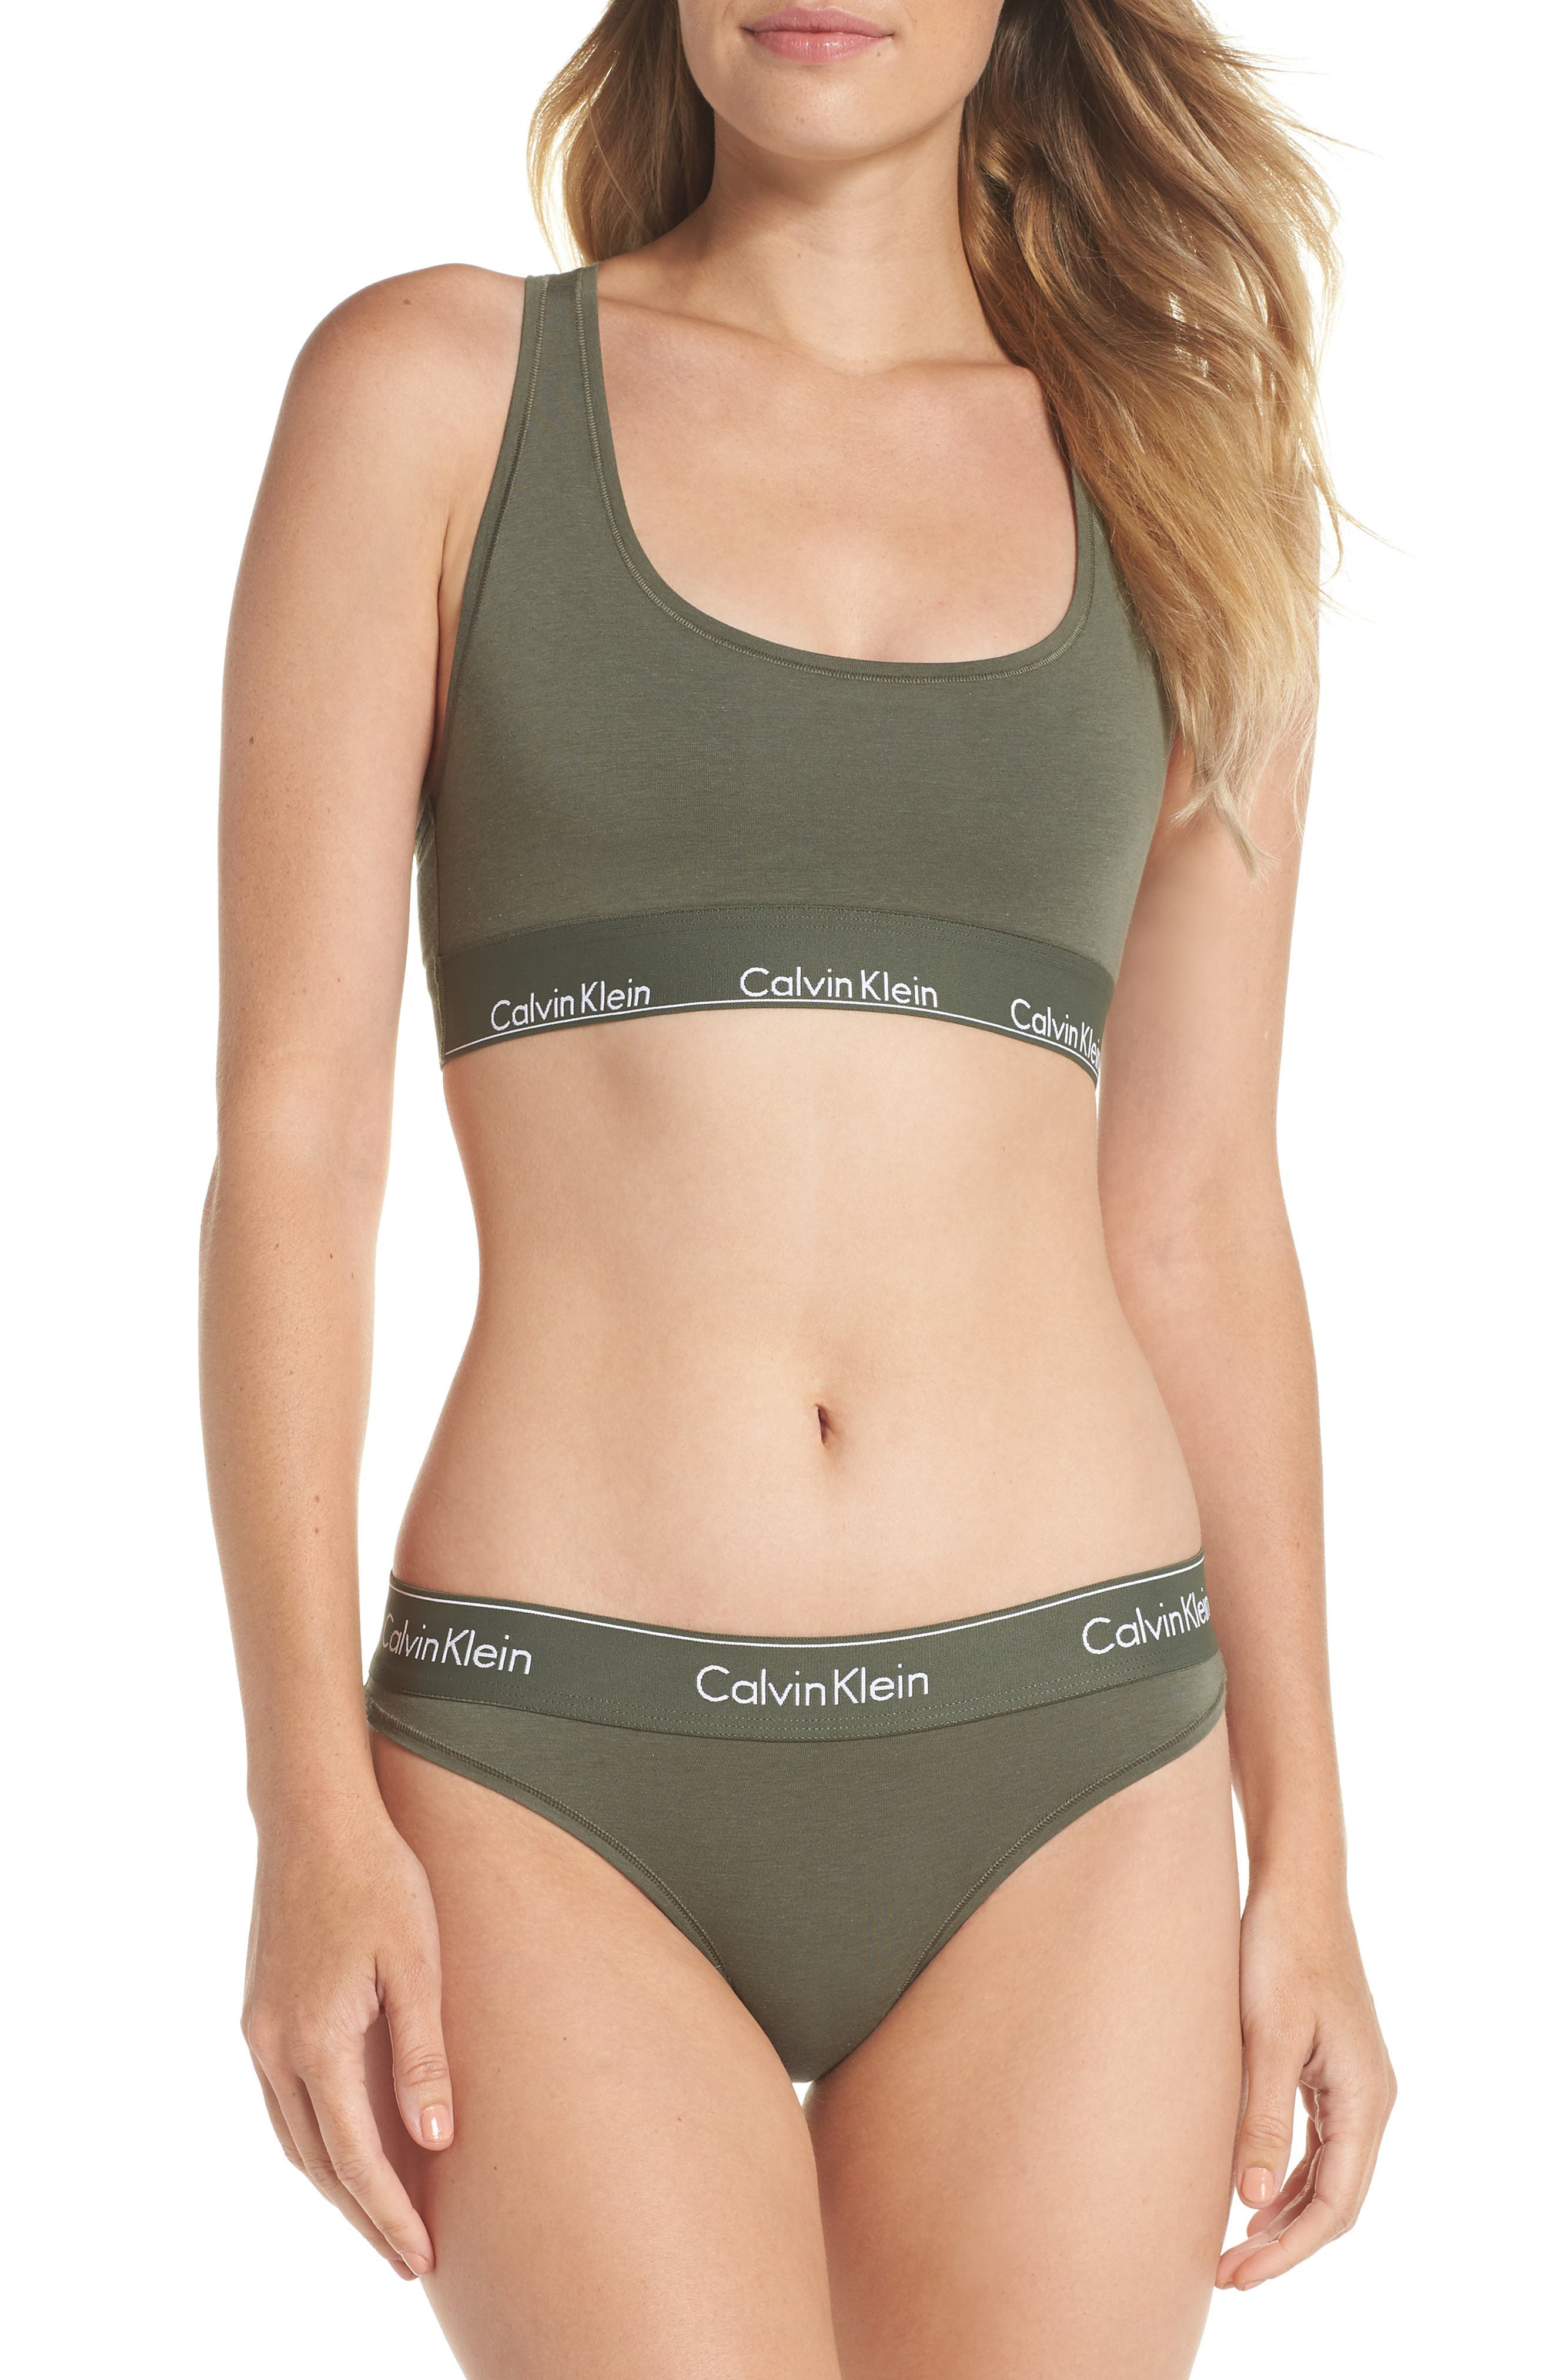 'Modern Cotton Collection' Cotton Blend Bikini,                             Alternate thumbnail 8, color,                             BEETLE